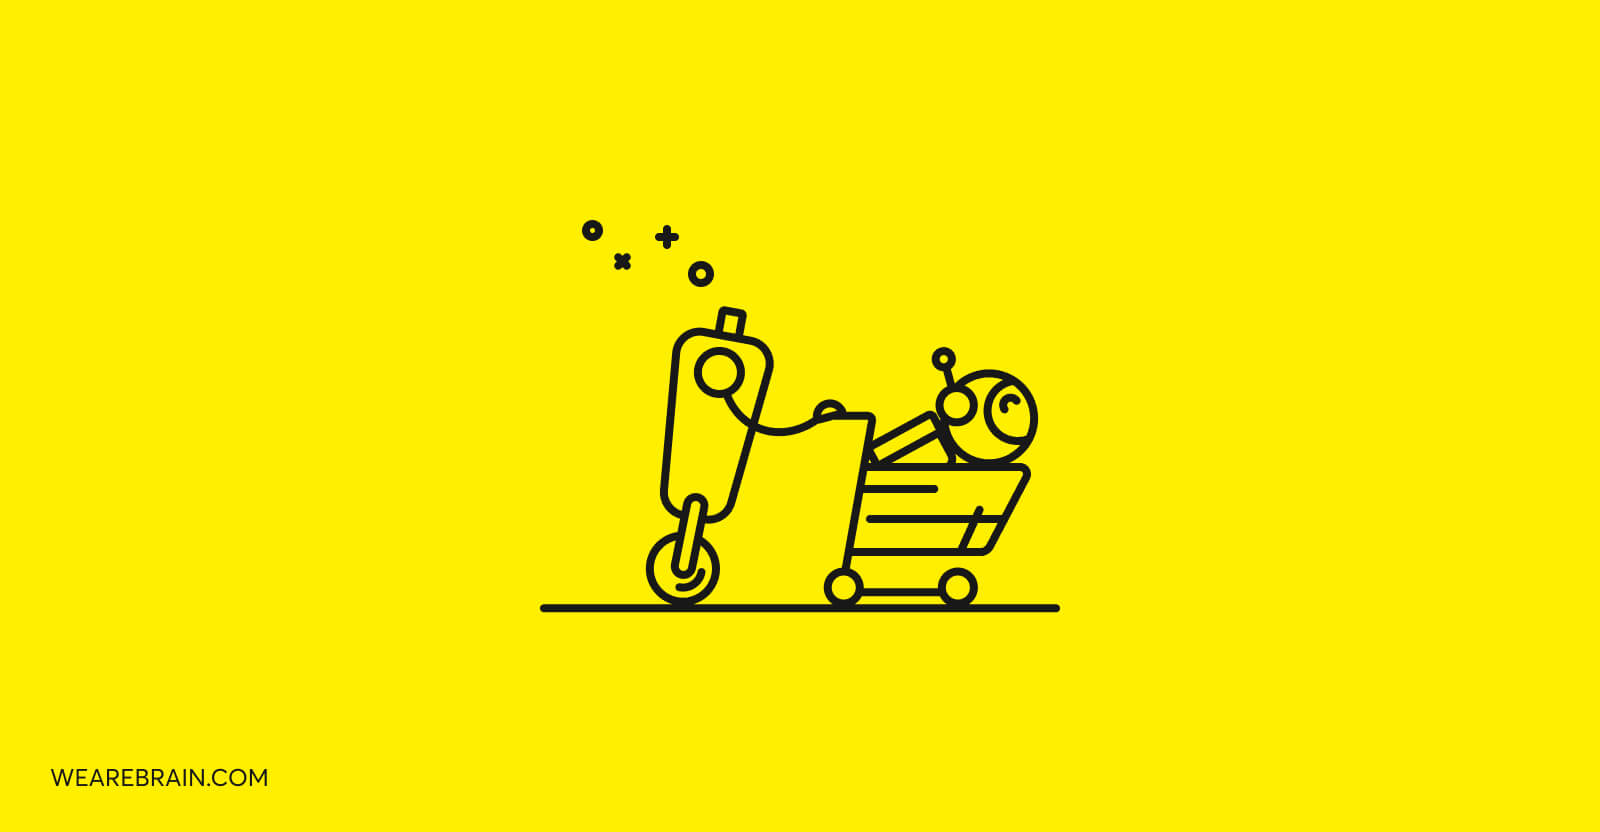 illustration of a headless shopping robot